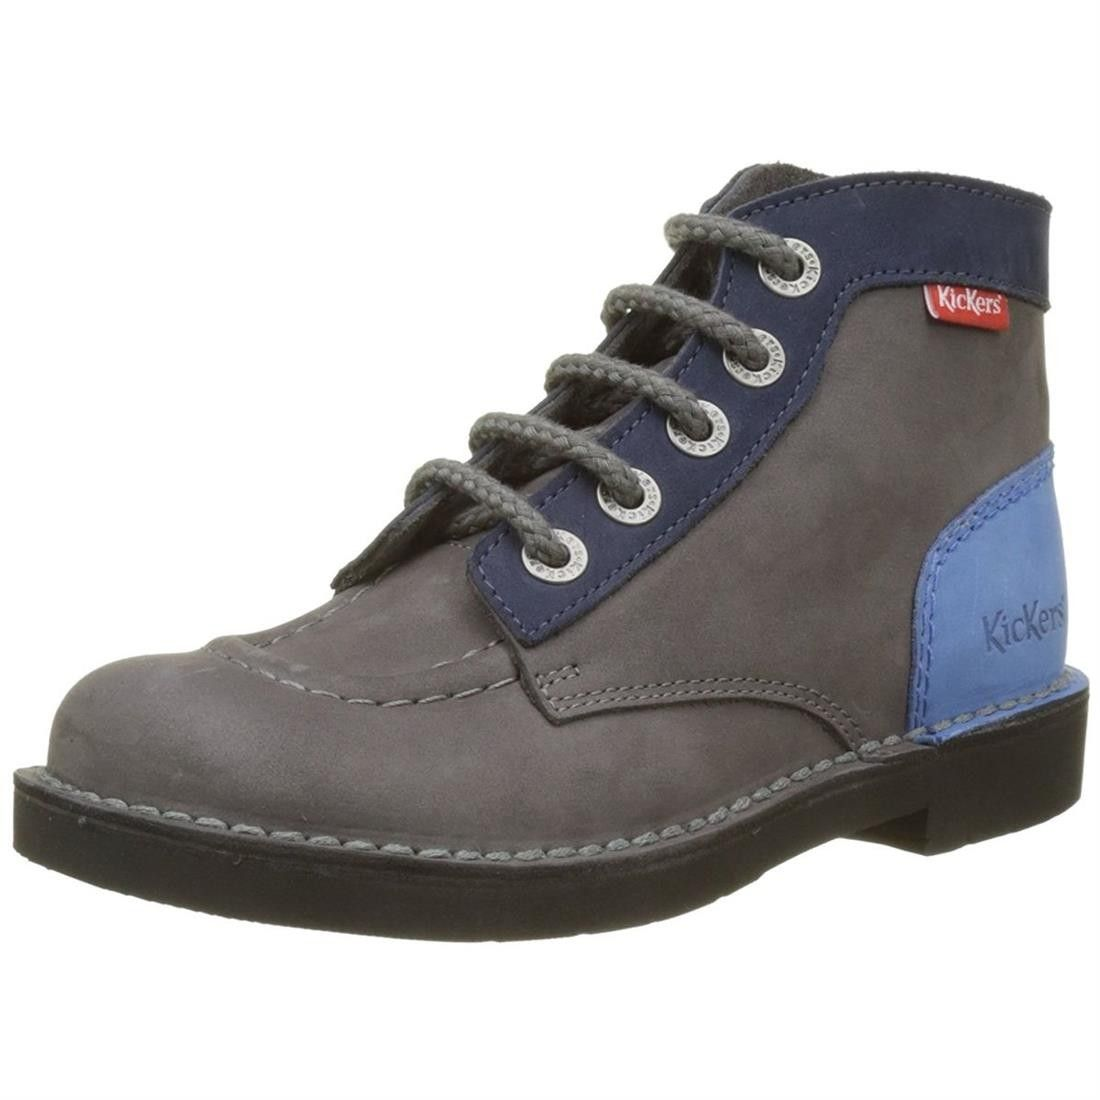 Kickers Boots Kickers Et Et Boots BreakBottines Homme BreakBottines Yv6fgyI7b